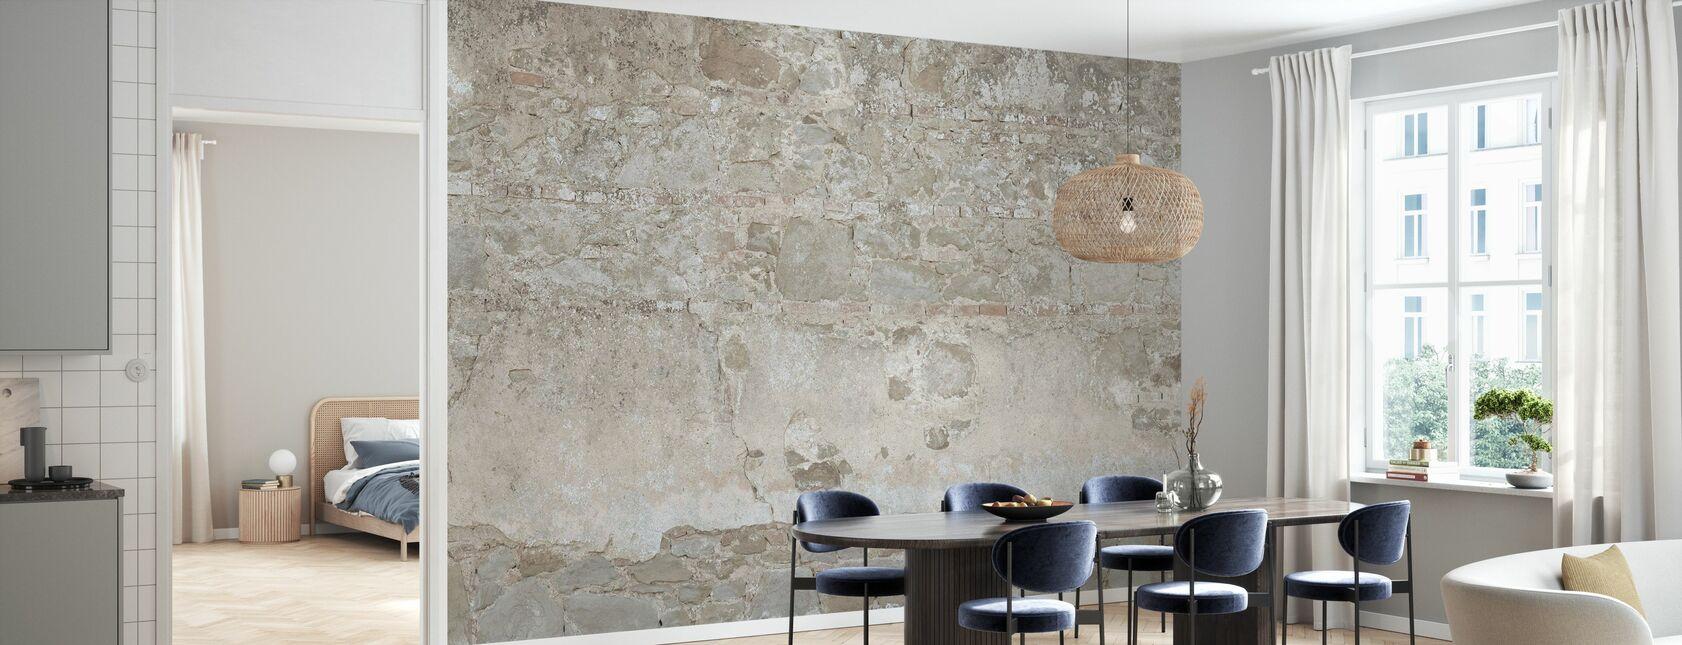 Bright Stone Wall - Wallpaper - Kitchen